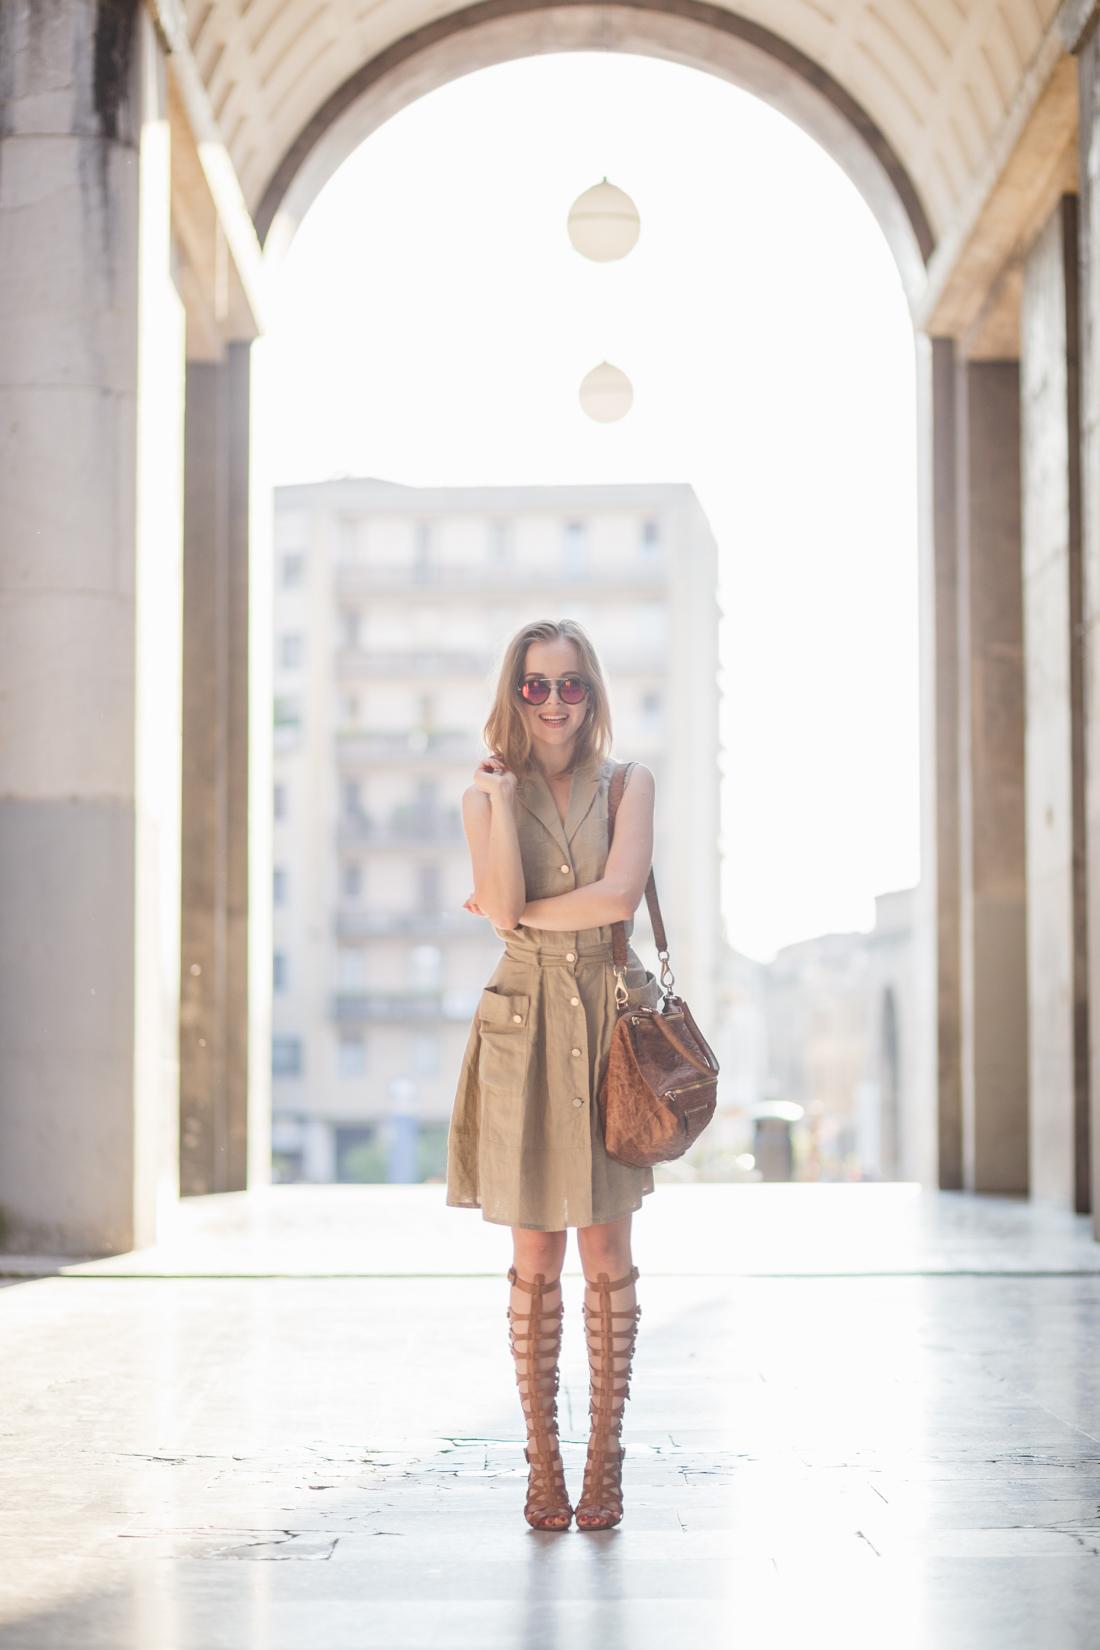 darya kamalova thecablook fashion lifestyle russian italian blogger wears stefanel dress schutz gladiators and giverchy pandora bag-1